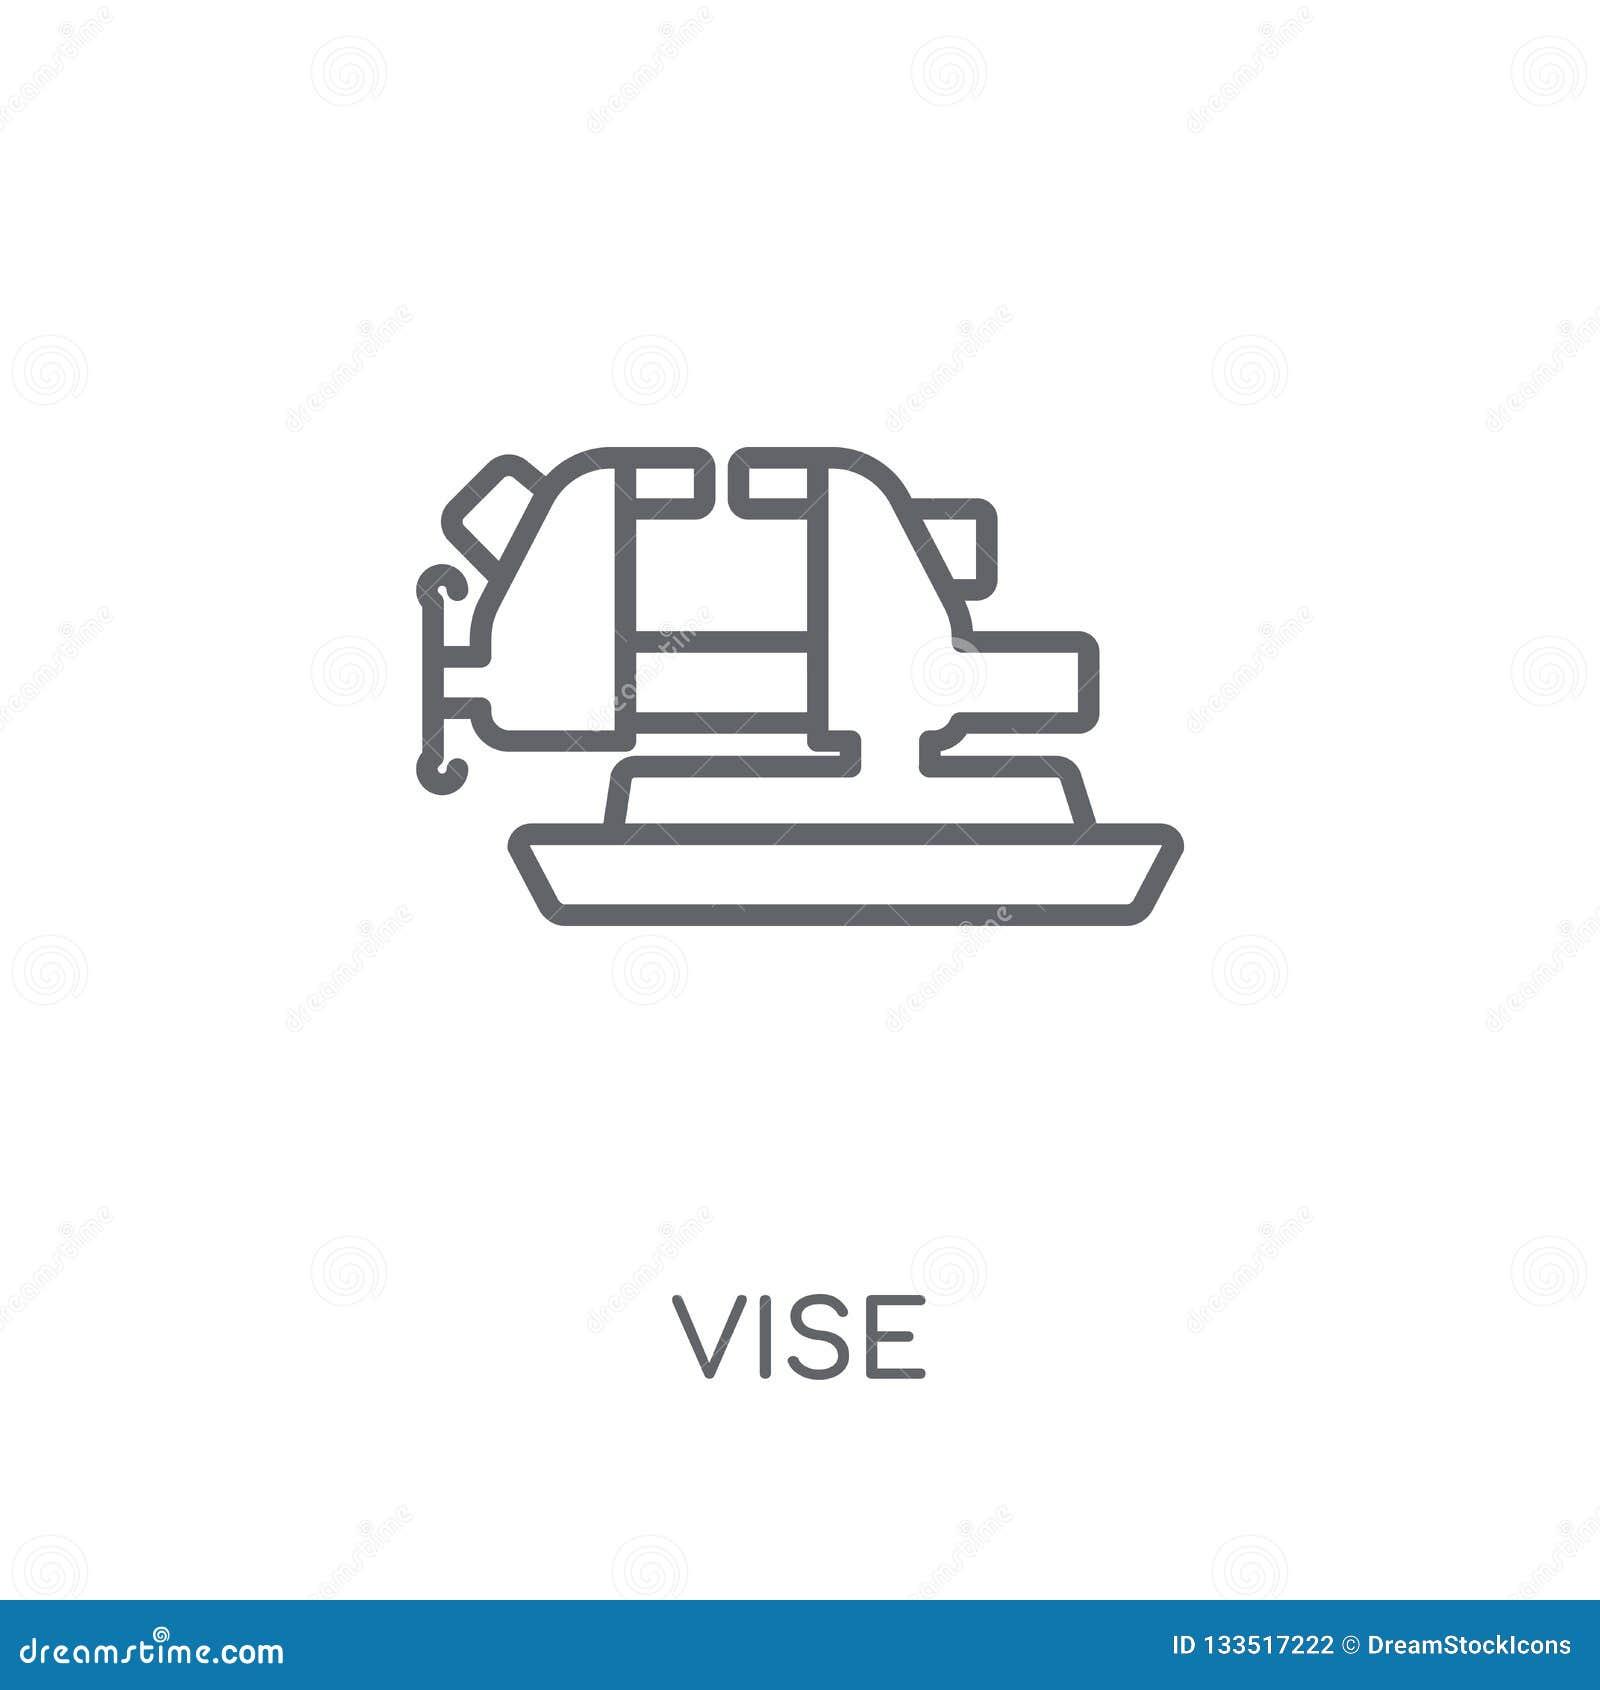 Vise linear icon. Modern outline Vise logo concept on white back